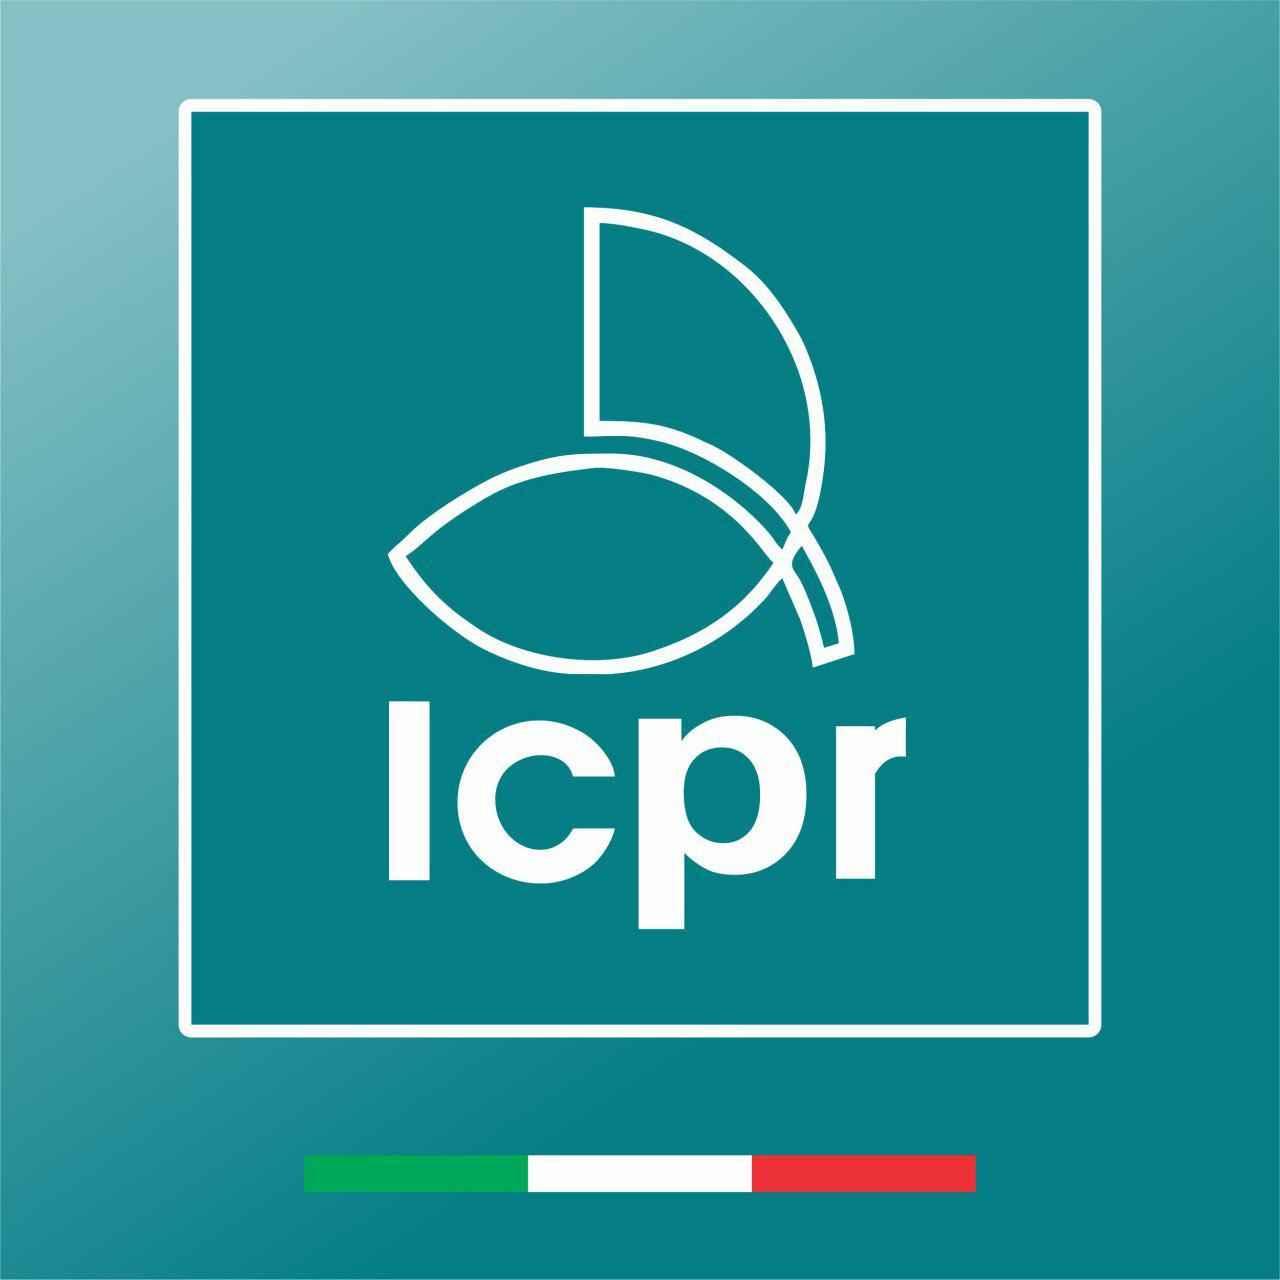 پانزدهمين کنفرانس بينالمللي روابط عمومي ايران با موضــوع برنامه ريزي بر پايه سناريو